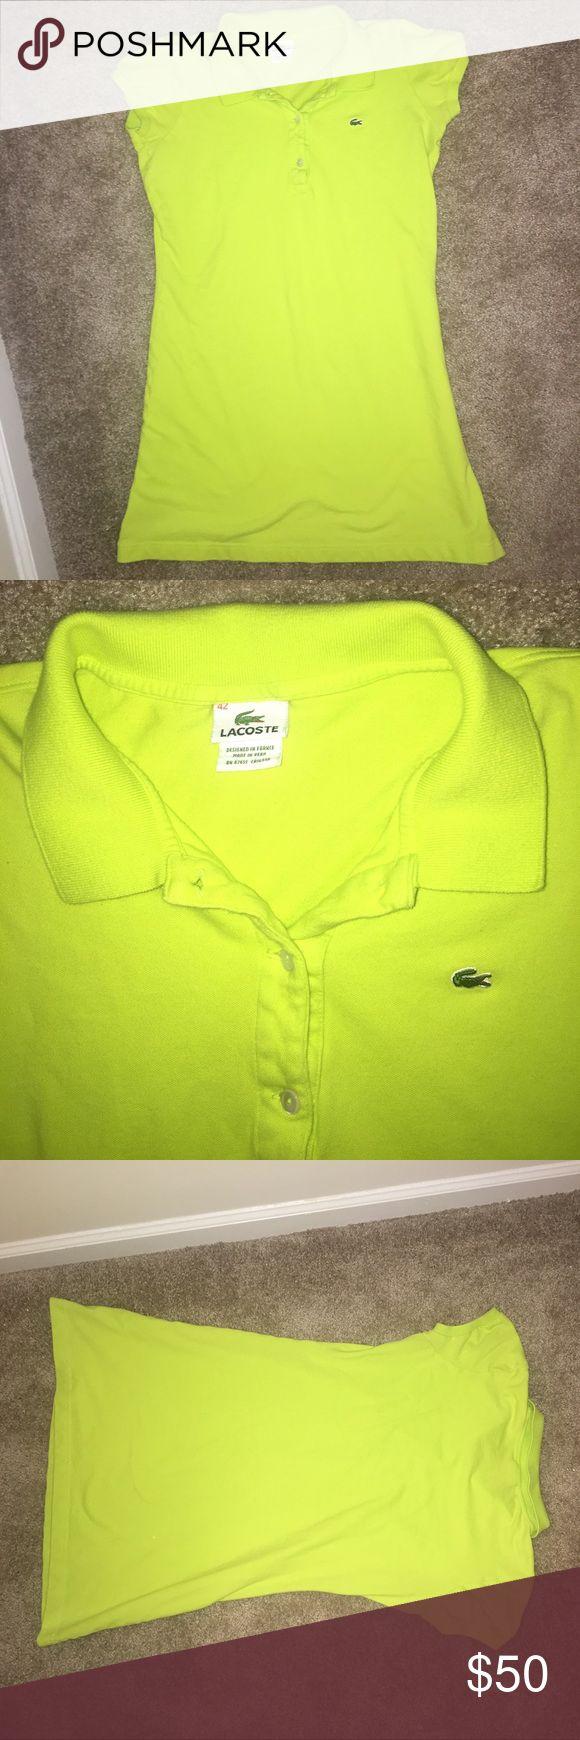 EUC Lacoste Neon Green Polo Dress 42 / Large Excellent condition Lacoste bright green polo dress. Size 42 (large). Super fun color! Runs small. Lacoste Dresses